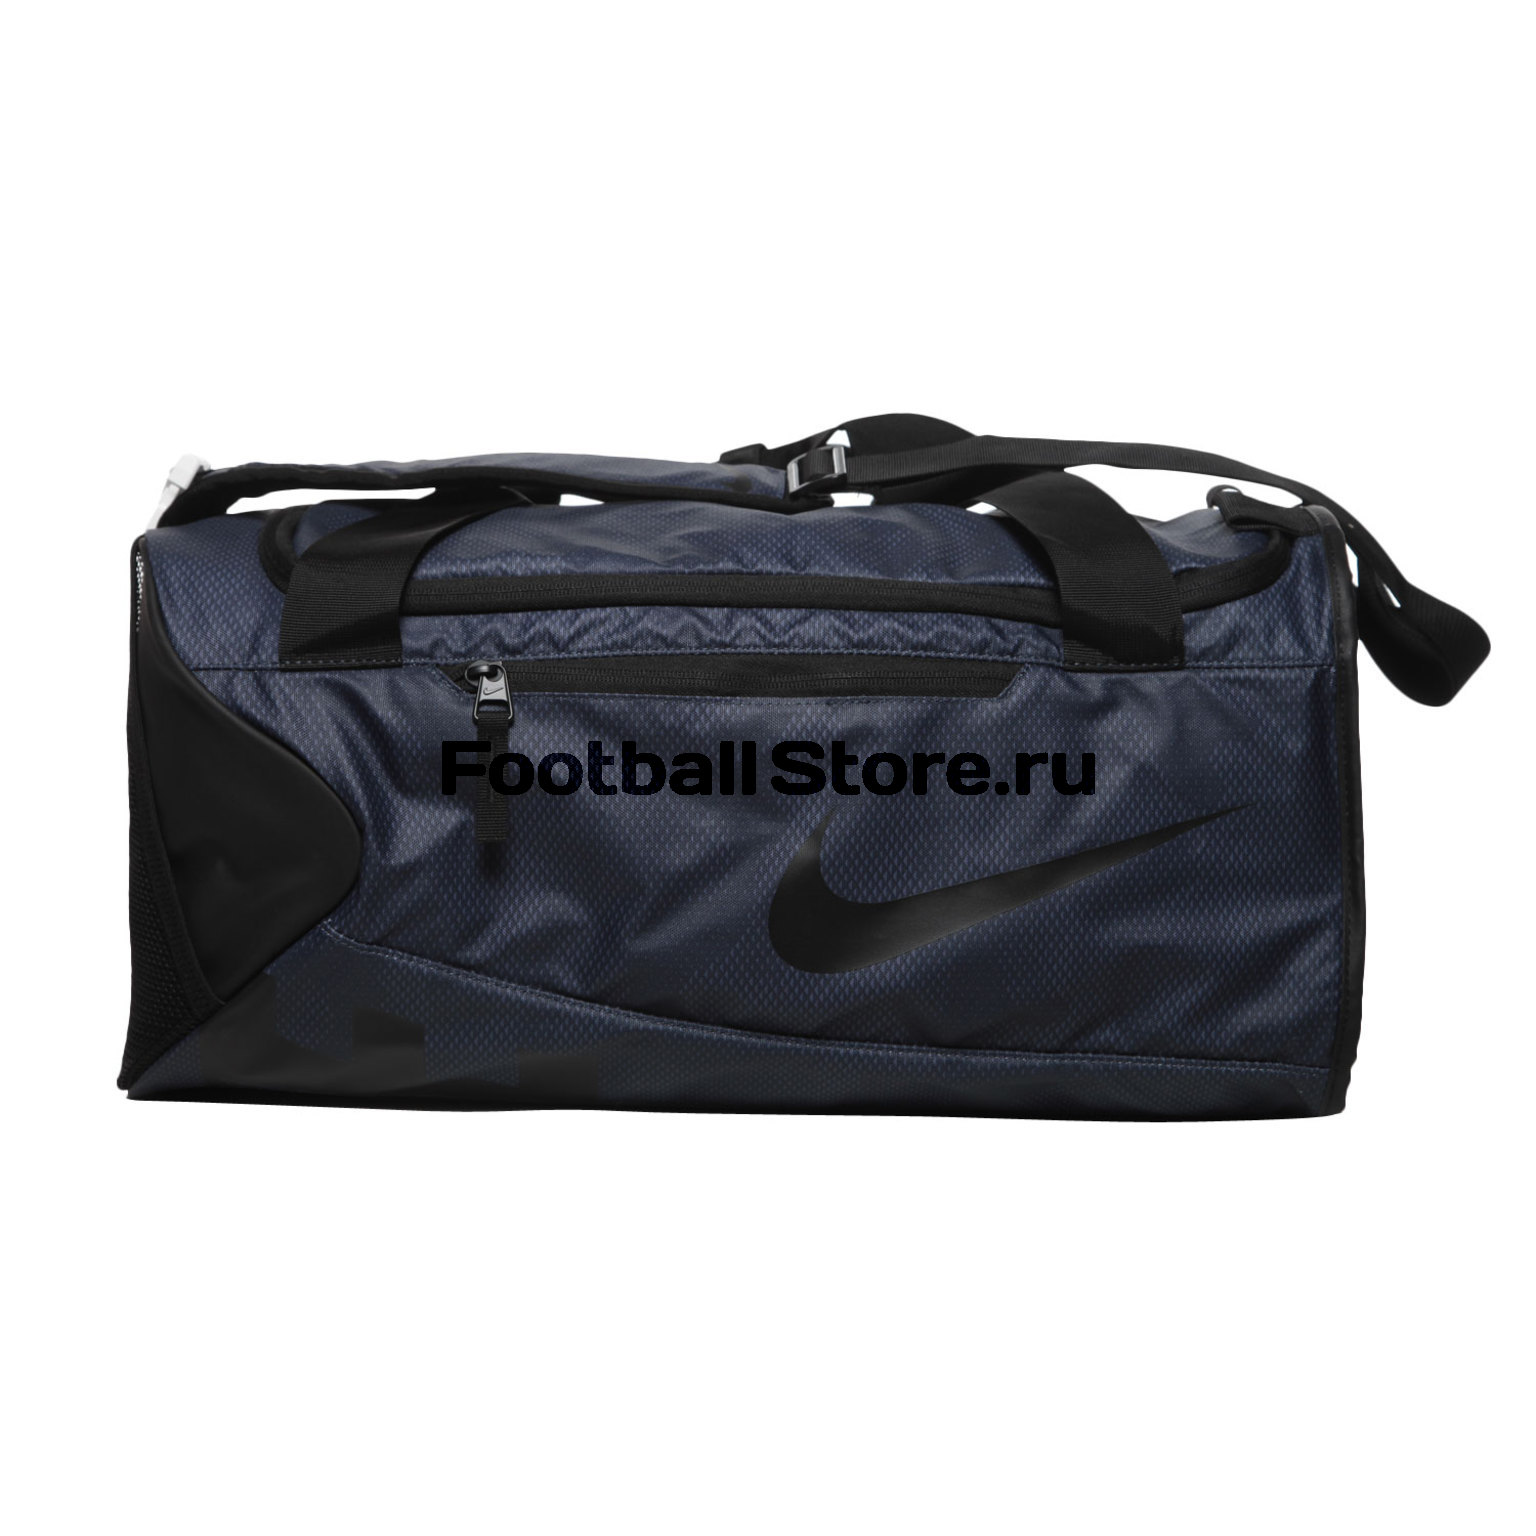 Сумки/Рюкзаки Nike Сумка Nike Alpha S Duff BA5180-471 сумки рюкзаки alpha cумка alpha keepers players action 9101